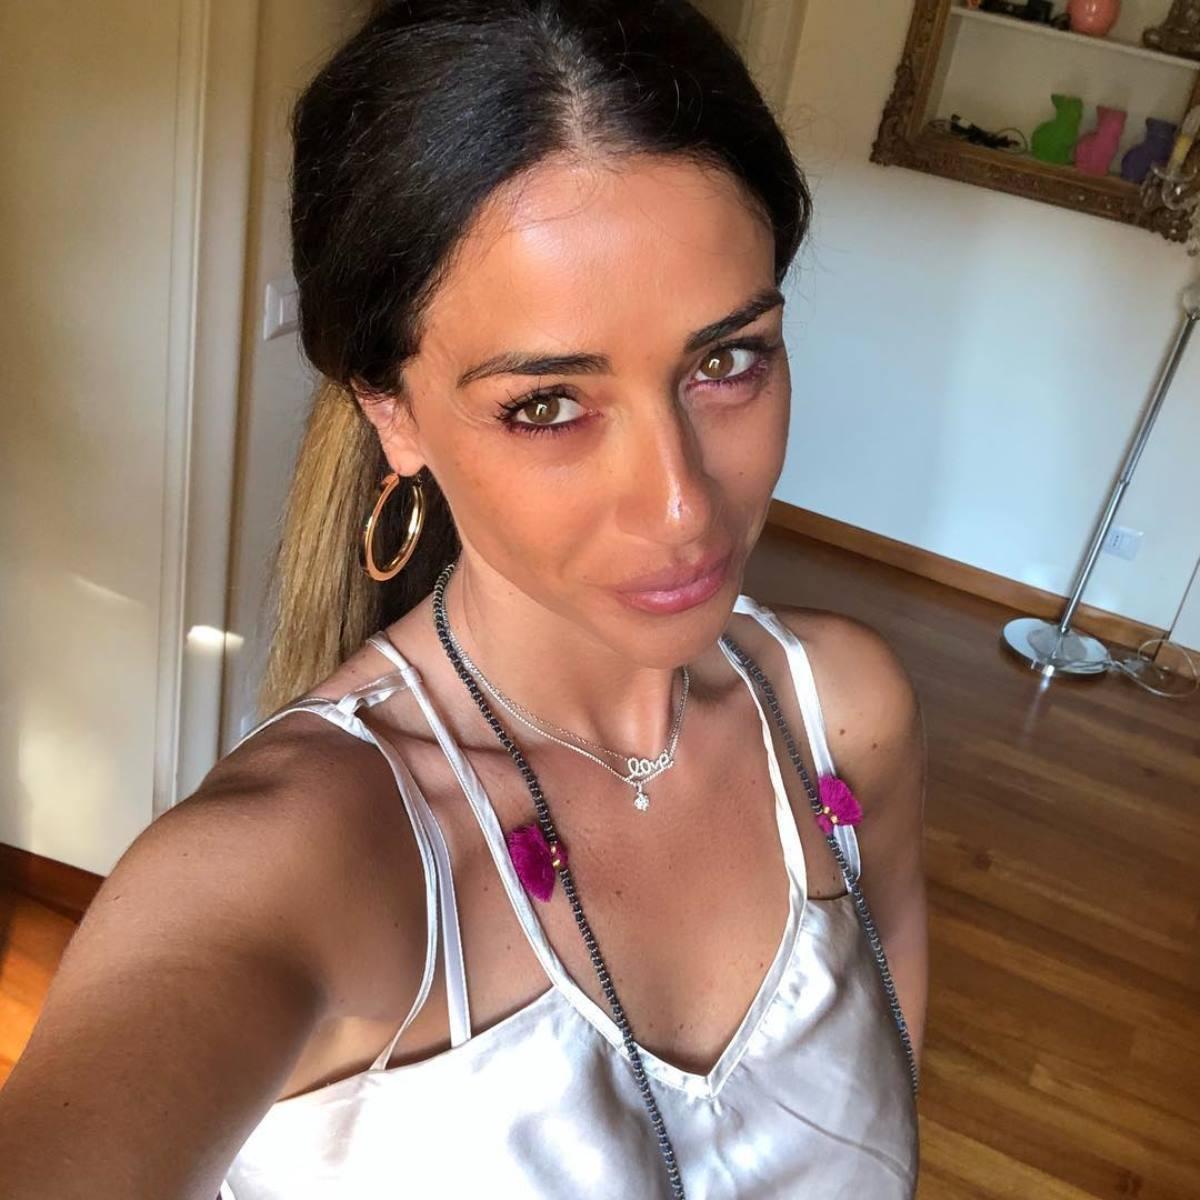 Raffaella Mennoia Tiroide